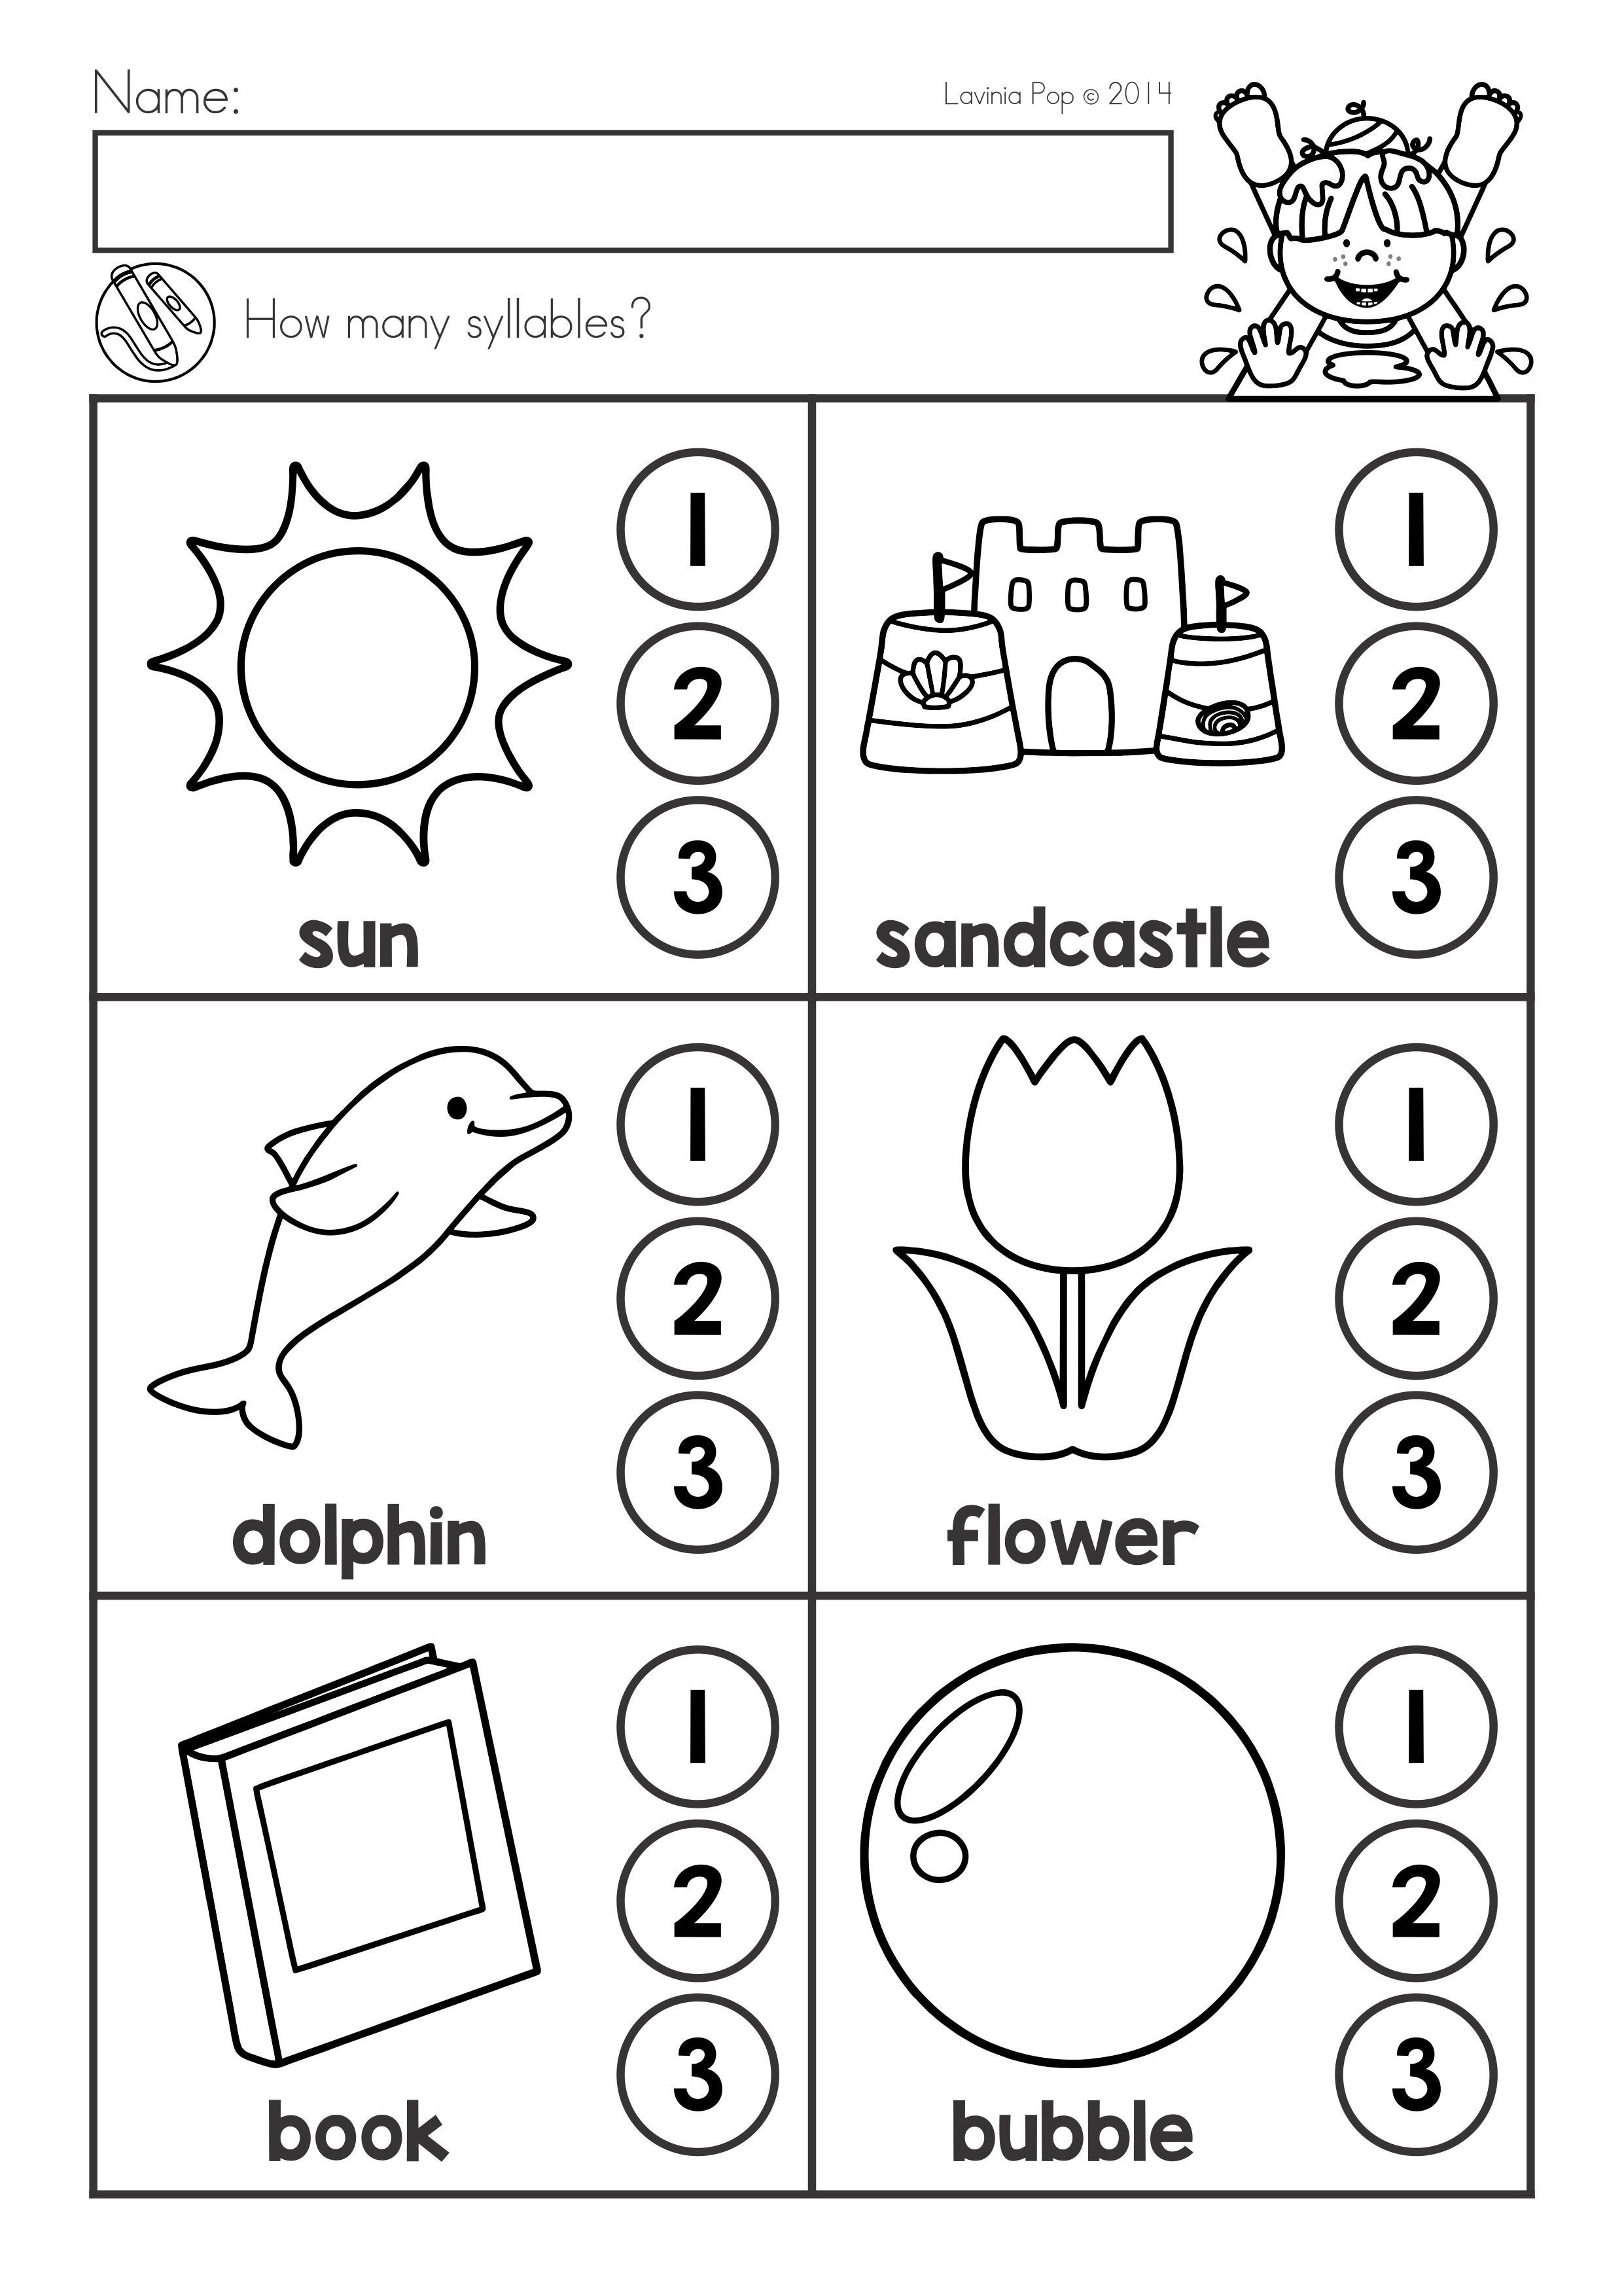 Summer Review Kindergarten Math Literacy Worksheets Activities Syllables Free Kindergarten Worksheets Syllable Worksheet Literacy Worksheets